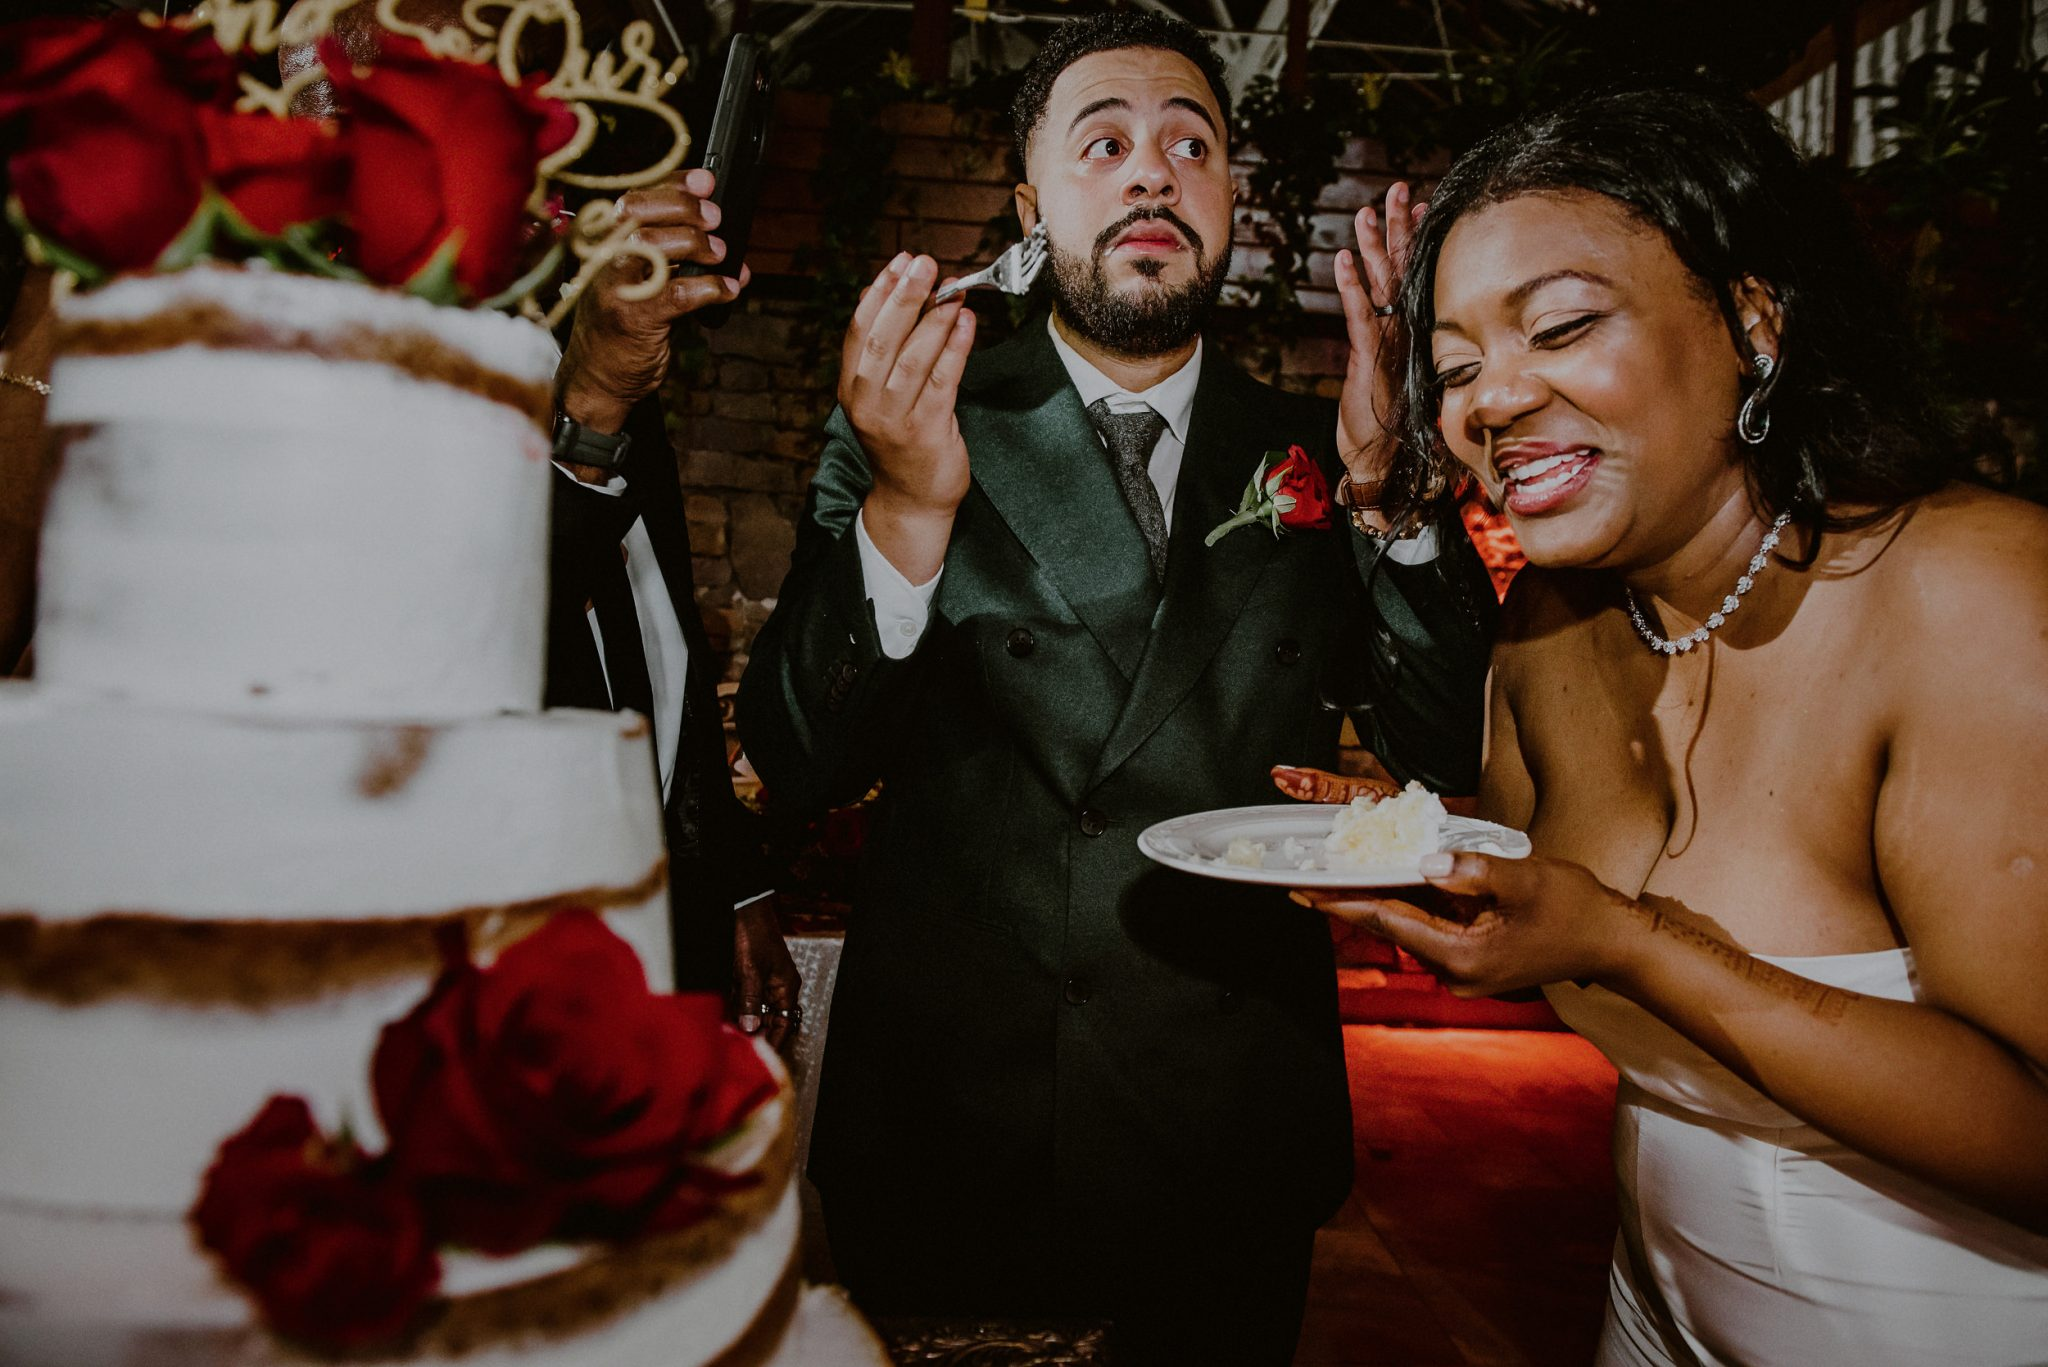 francesco's wedding cake photo at fox hollow wedding venue